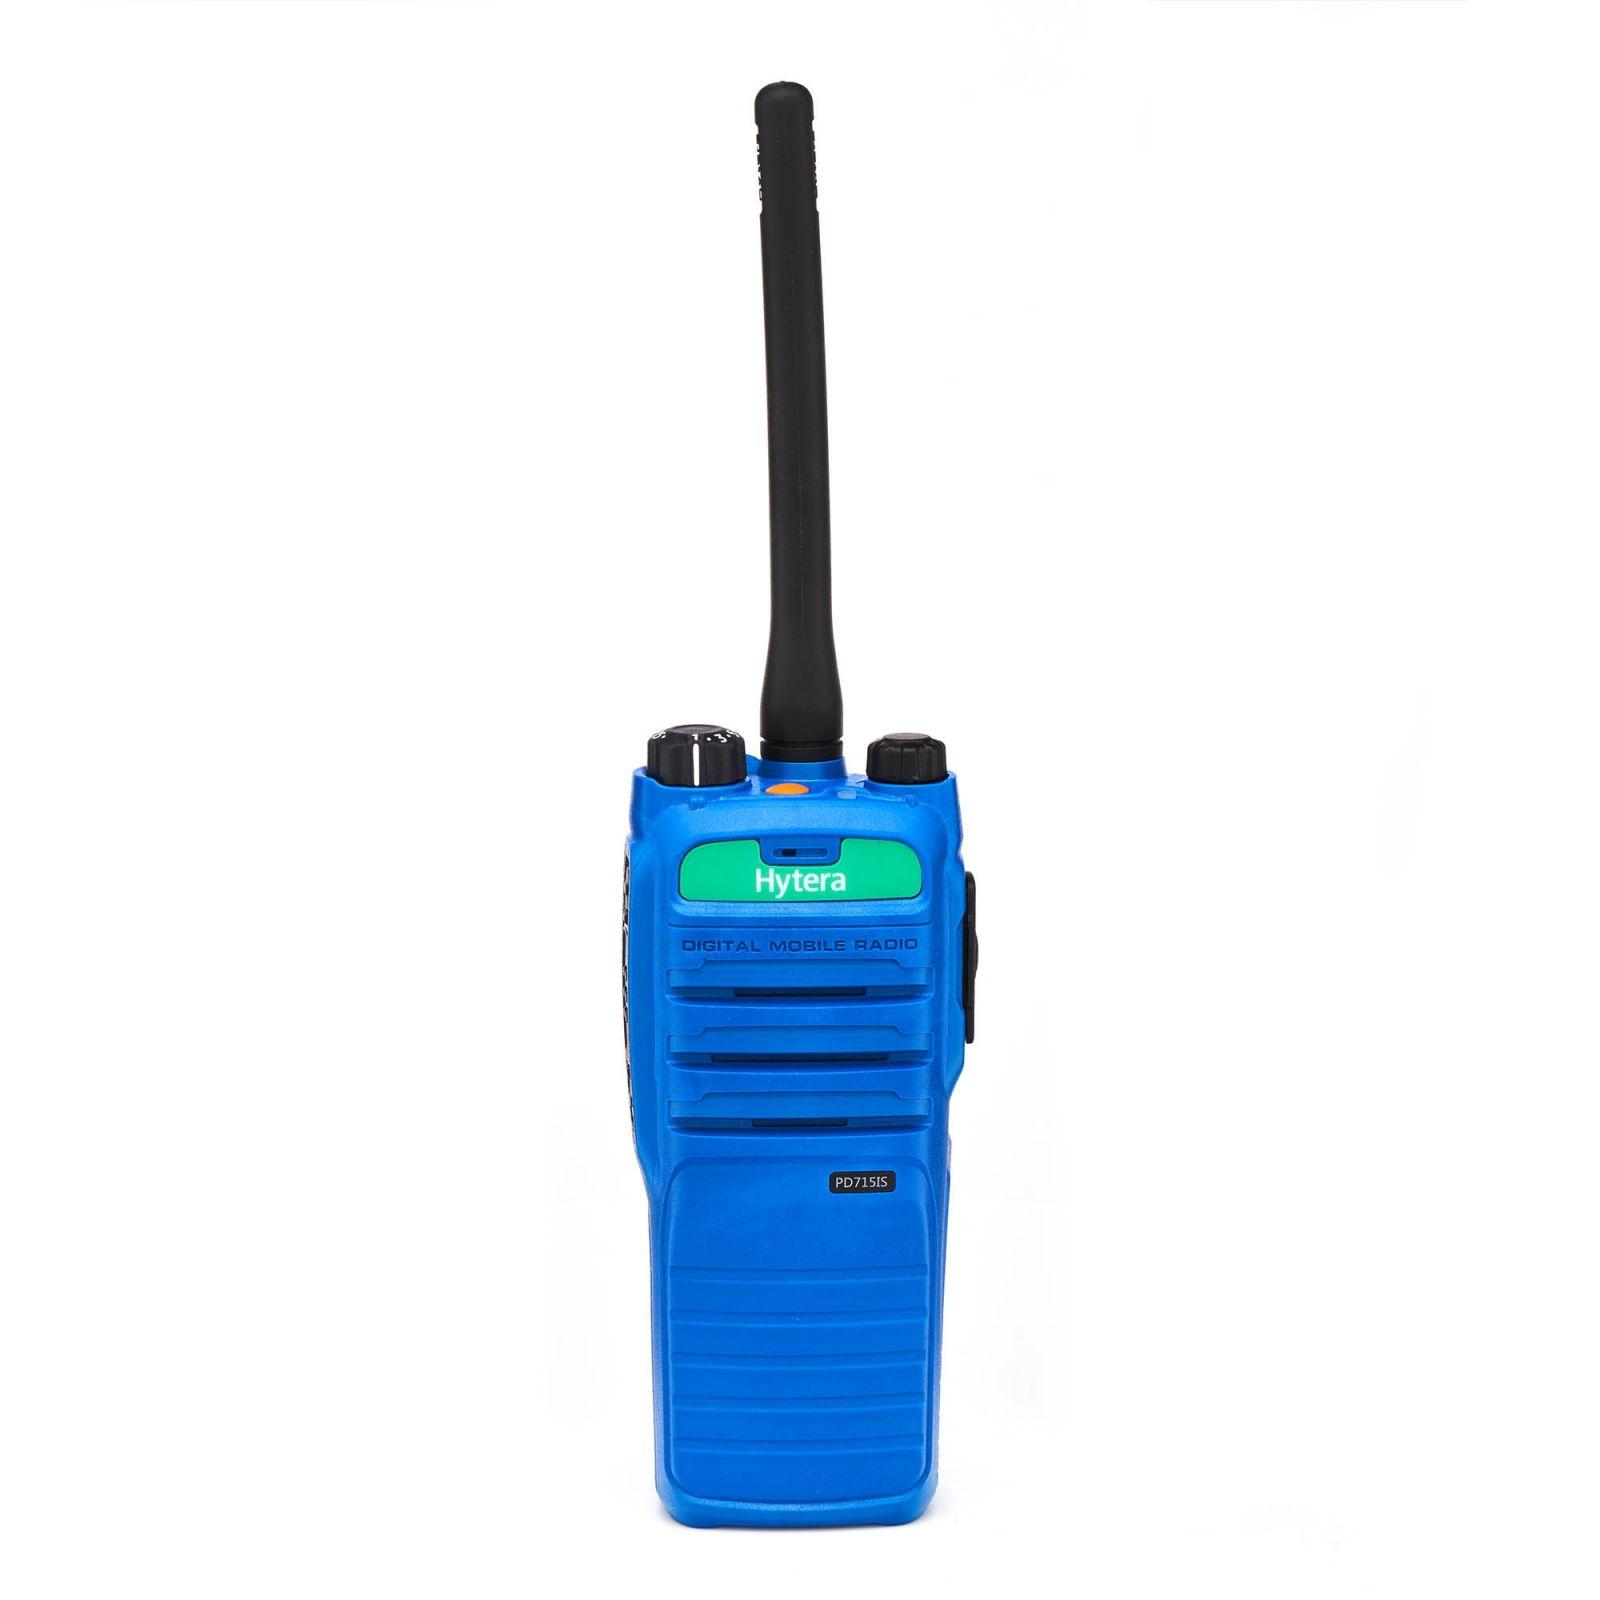 HYTERA PD715IS PORTABLE RADIO